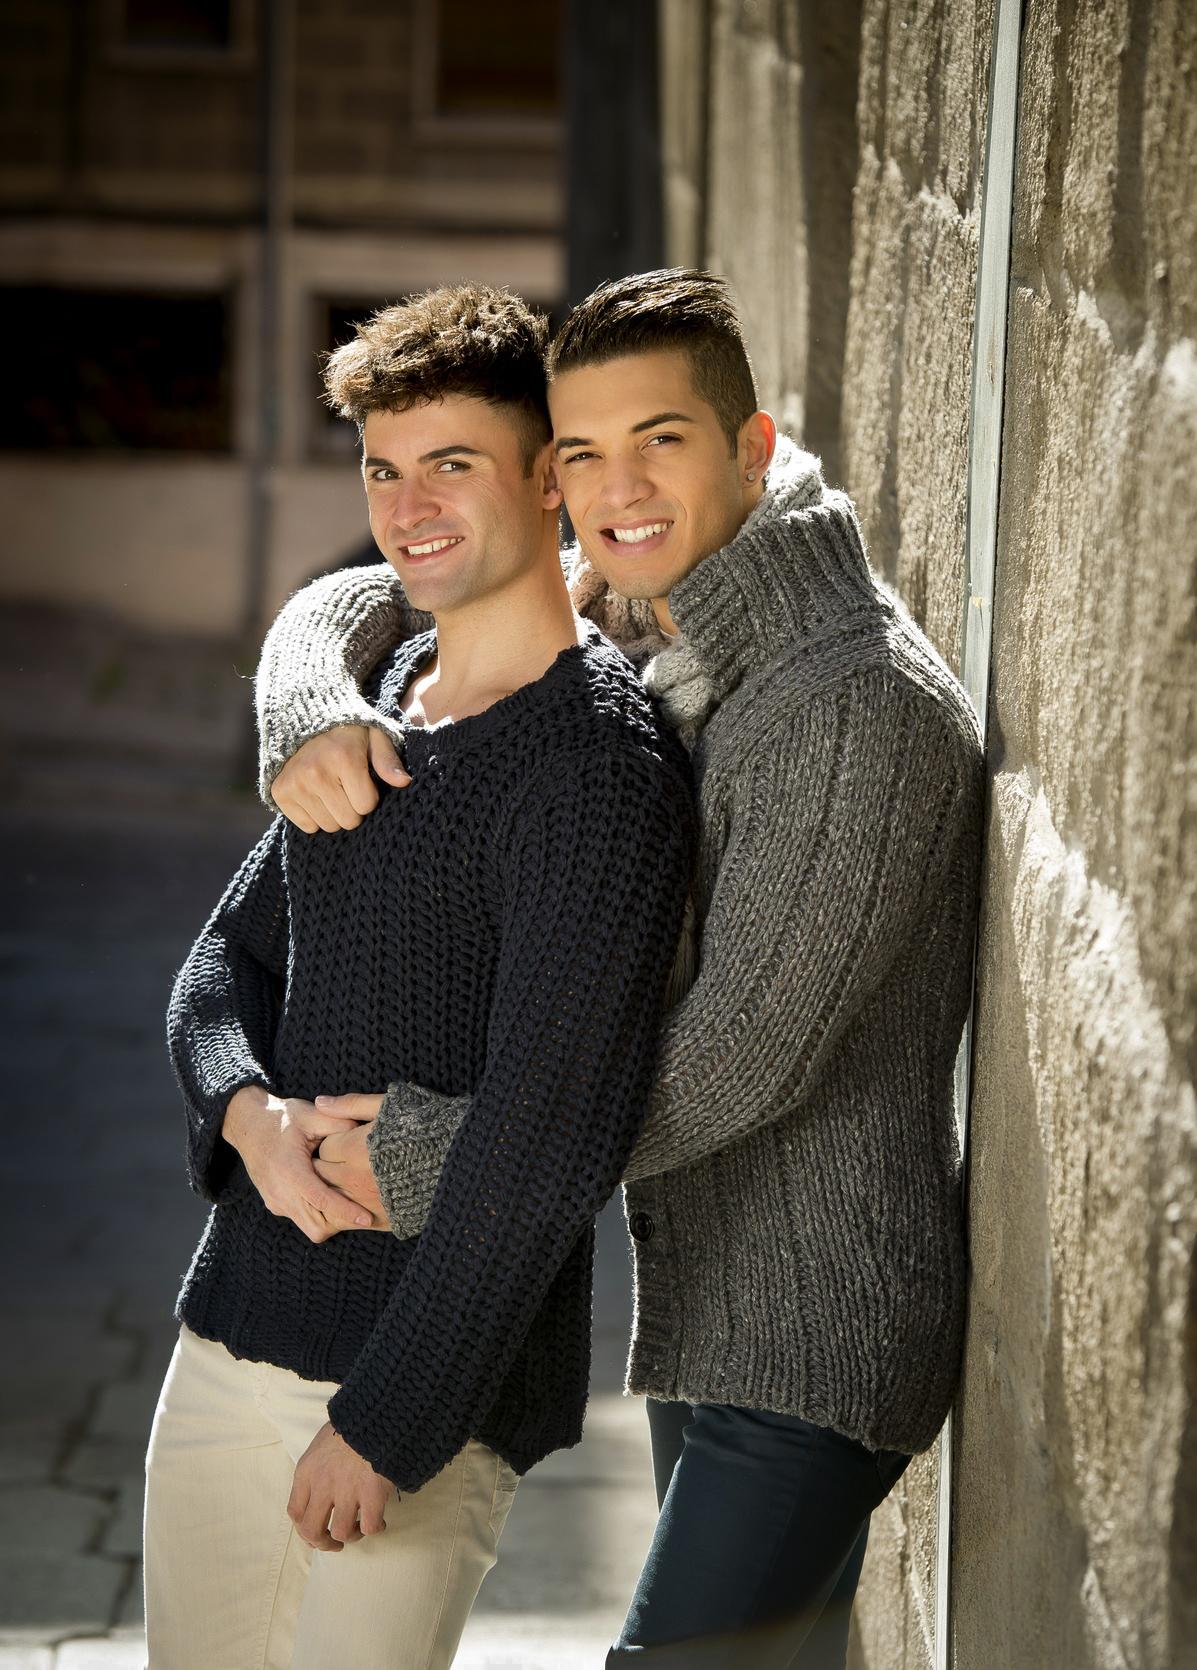 kansas-City--young-happy-gay-LGBT-Country-Club-Plaza.jpg